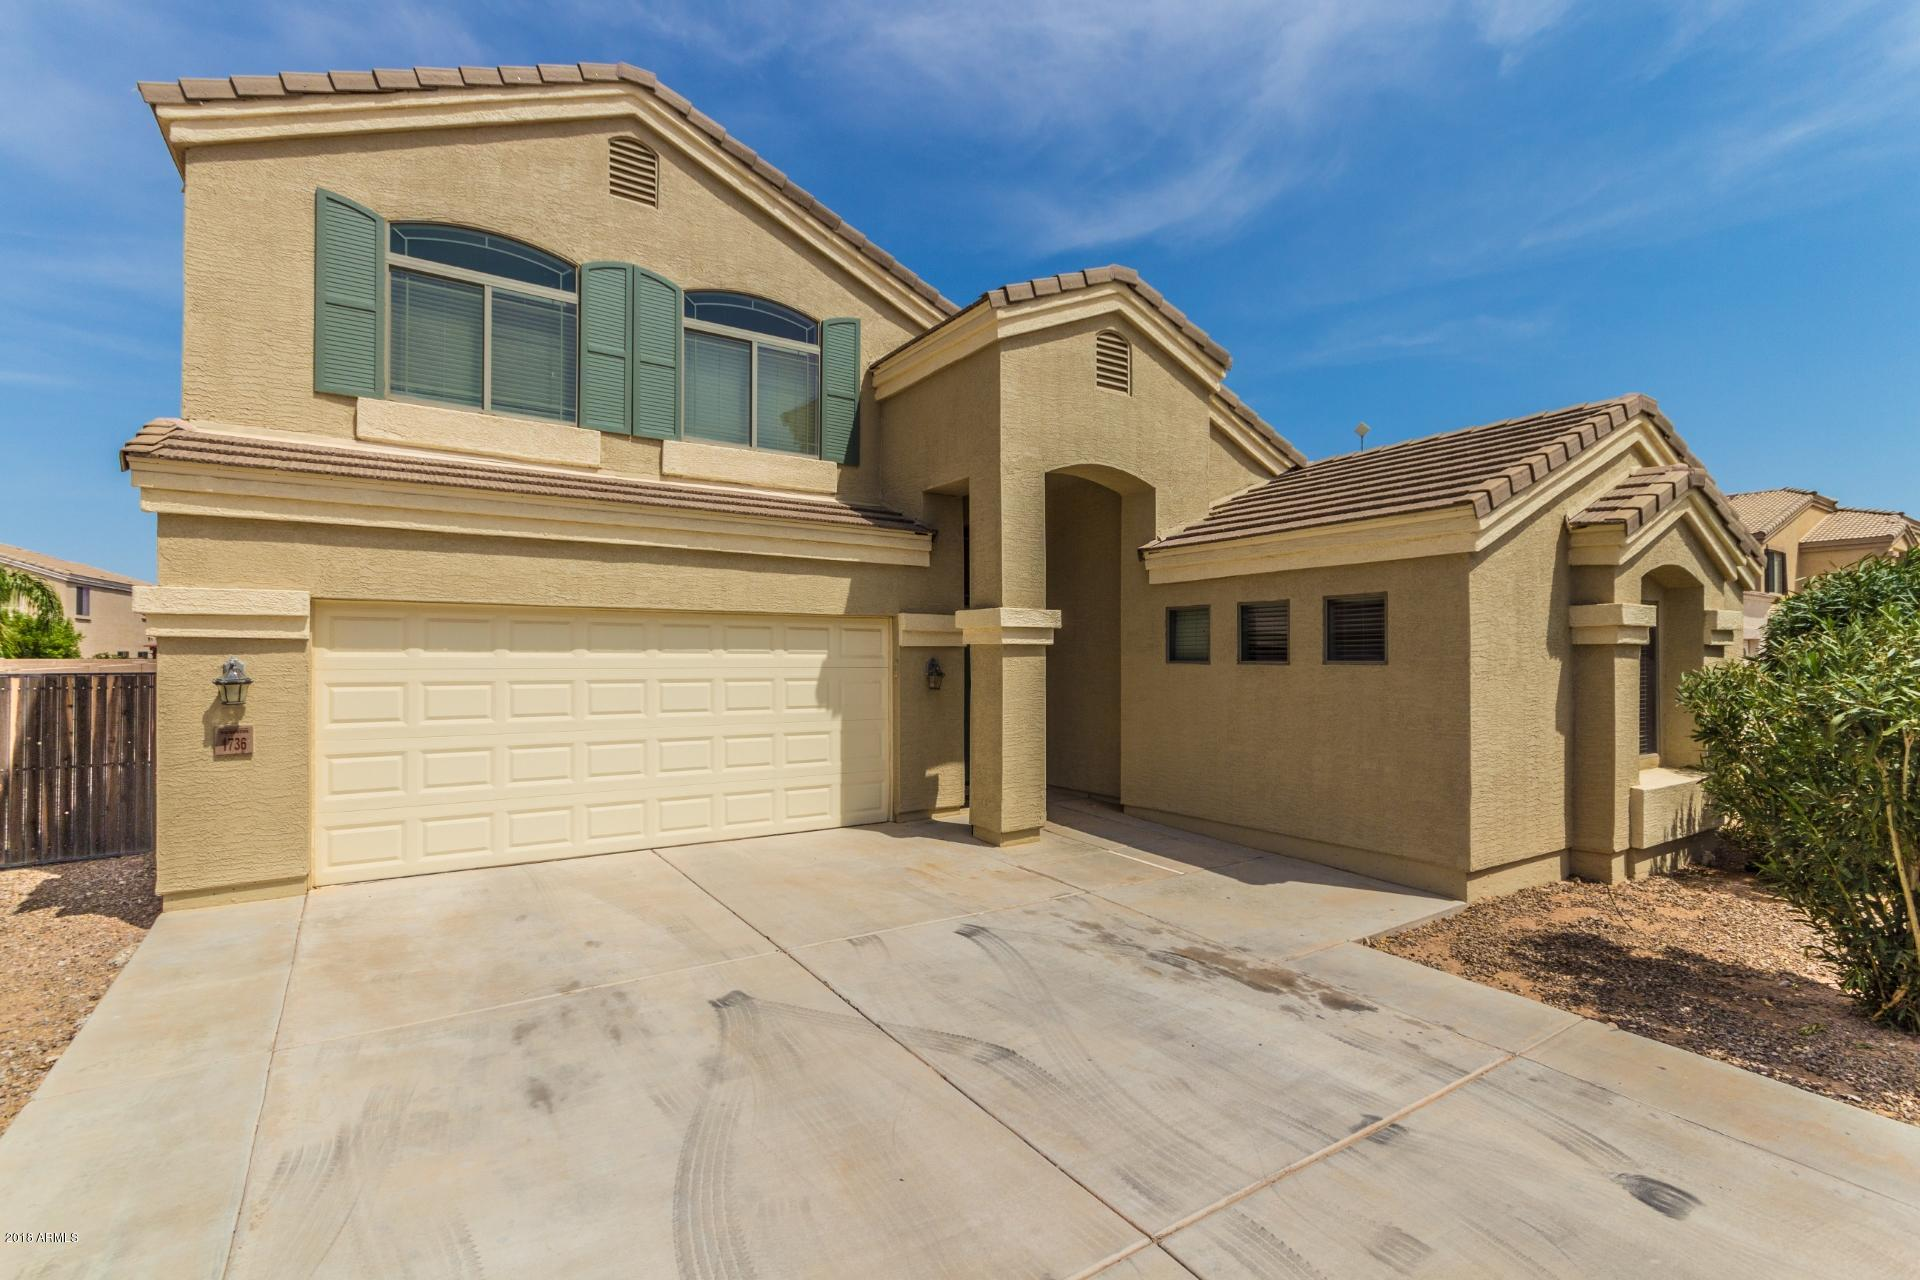 Photo for 1736 E Caborca Drive, Casa Grande, AZ 85122 (MLS # 5809794)